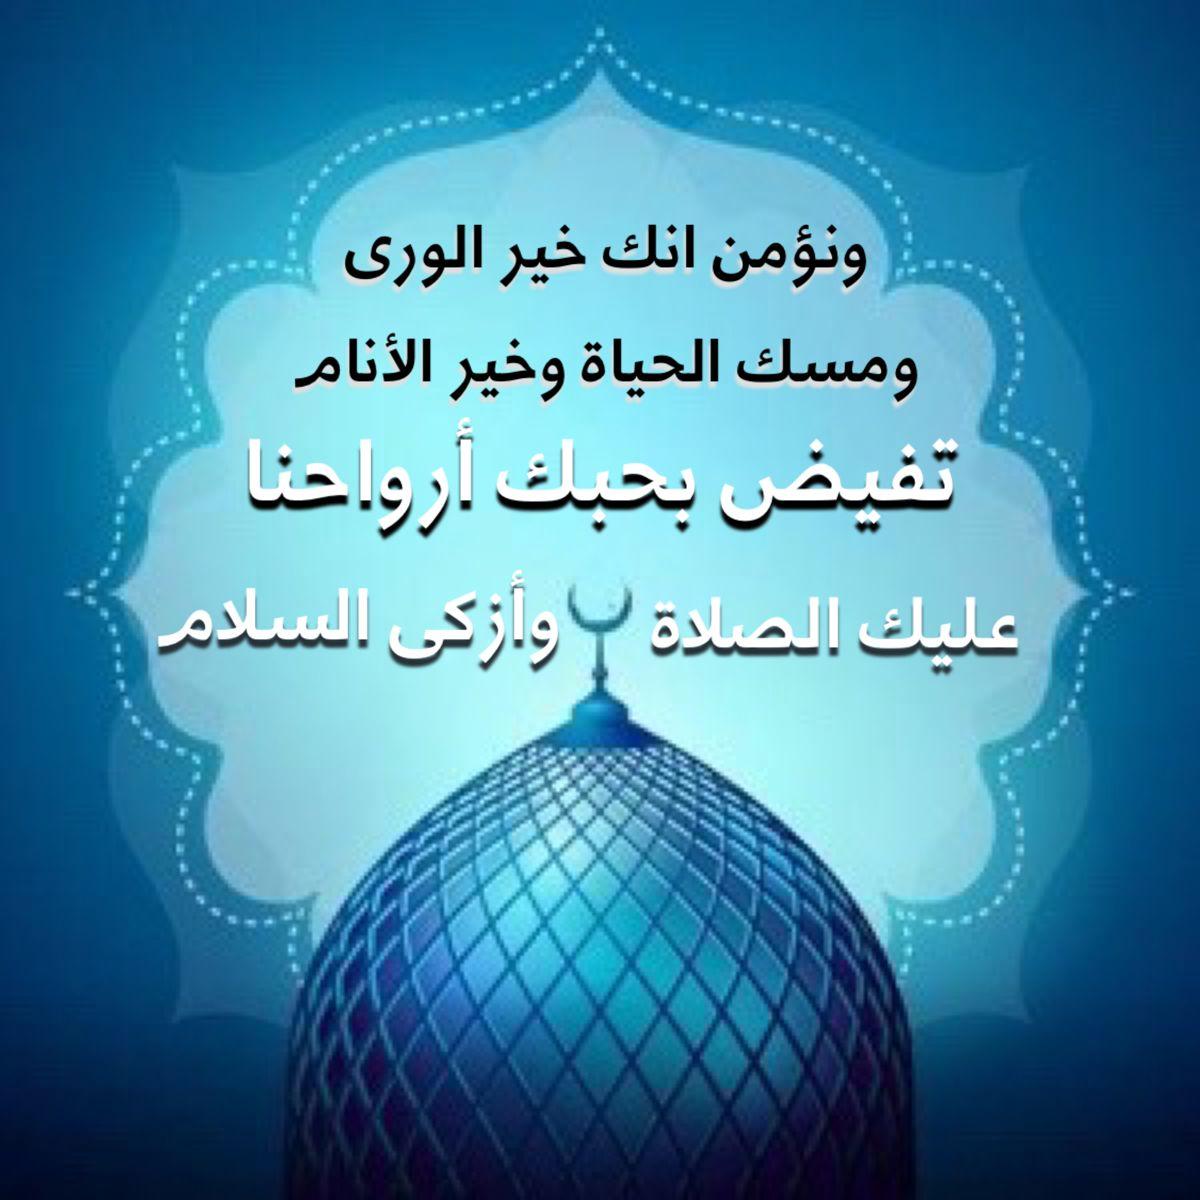 محمد صلى الله عليه و سلم ٢٠٢٠ Christmas Bulbs Christmas Ornaments Holiday Decor